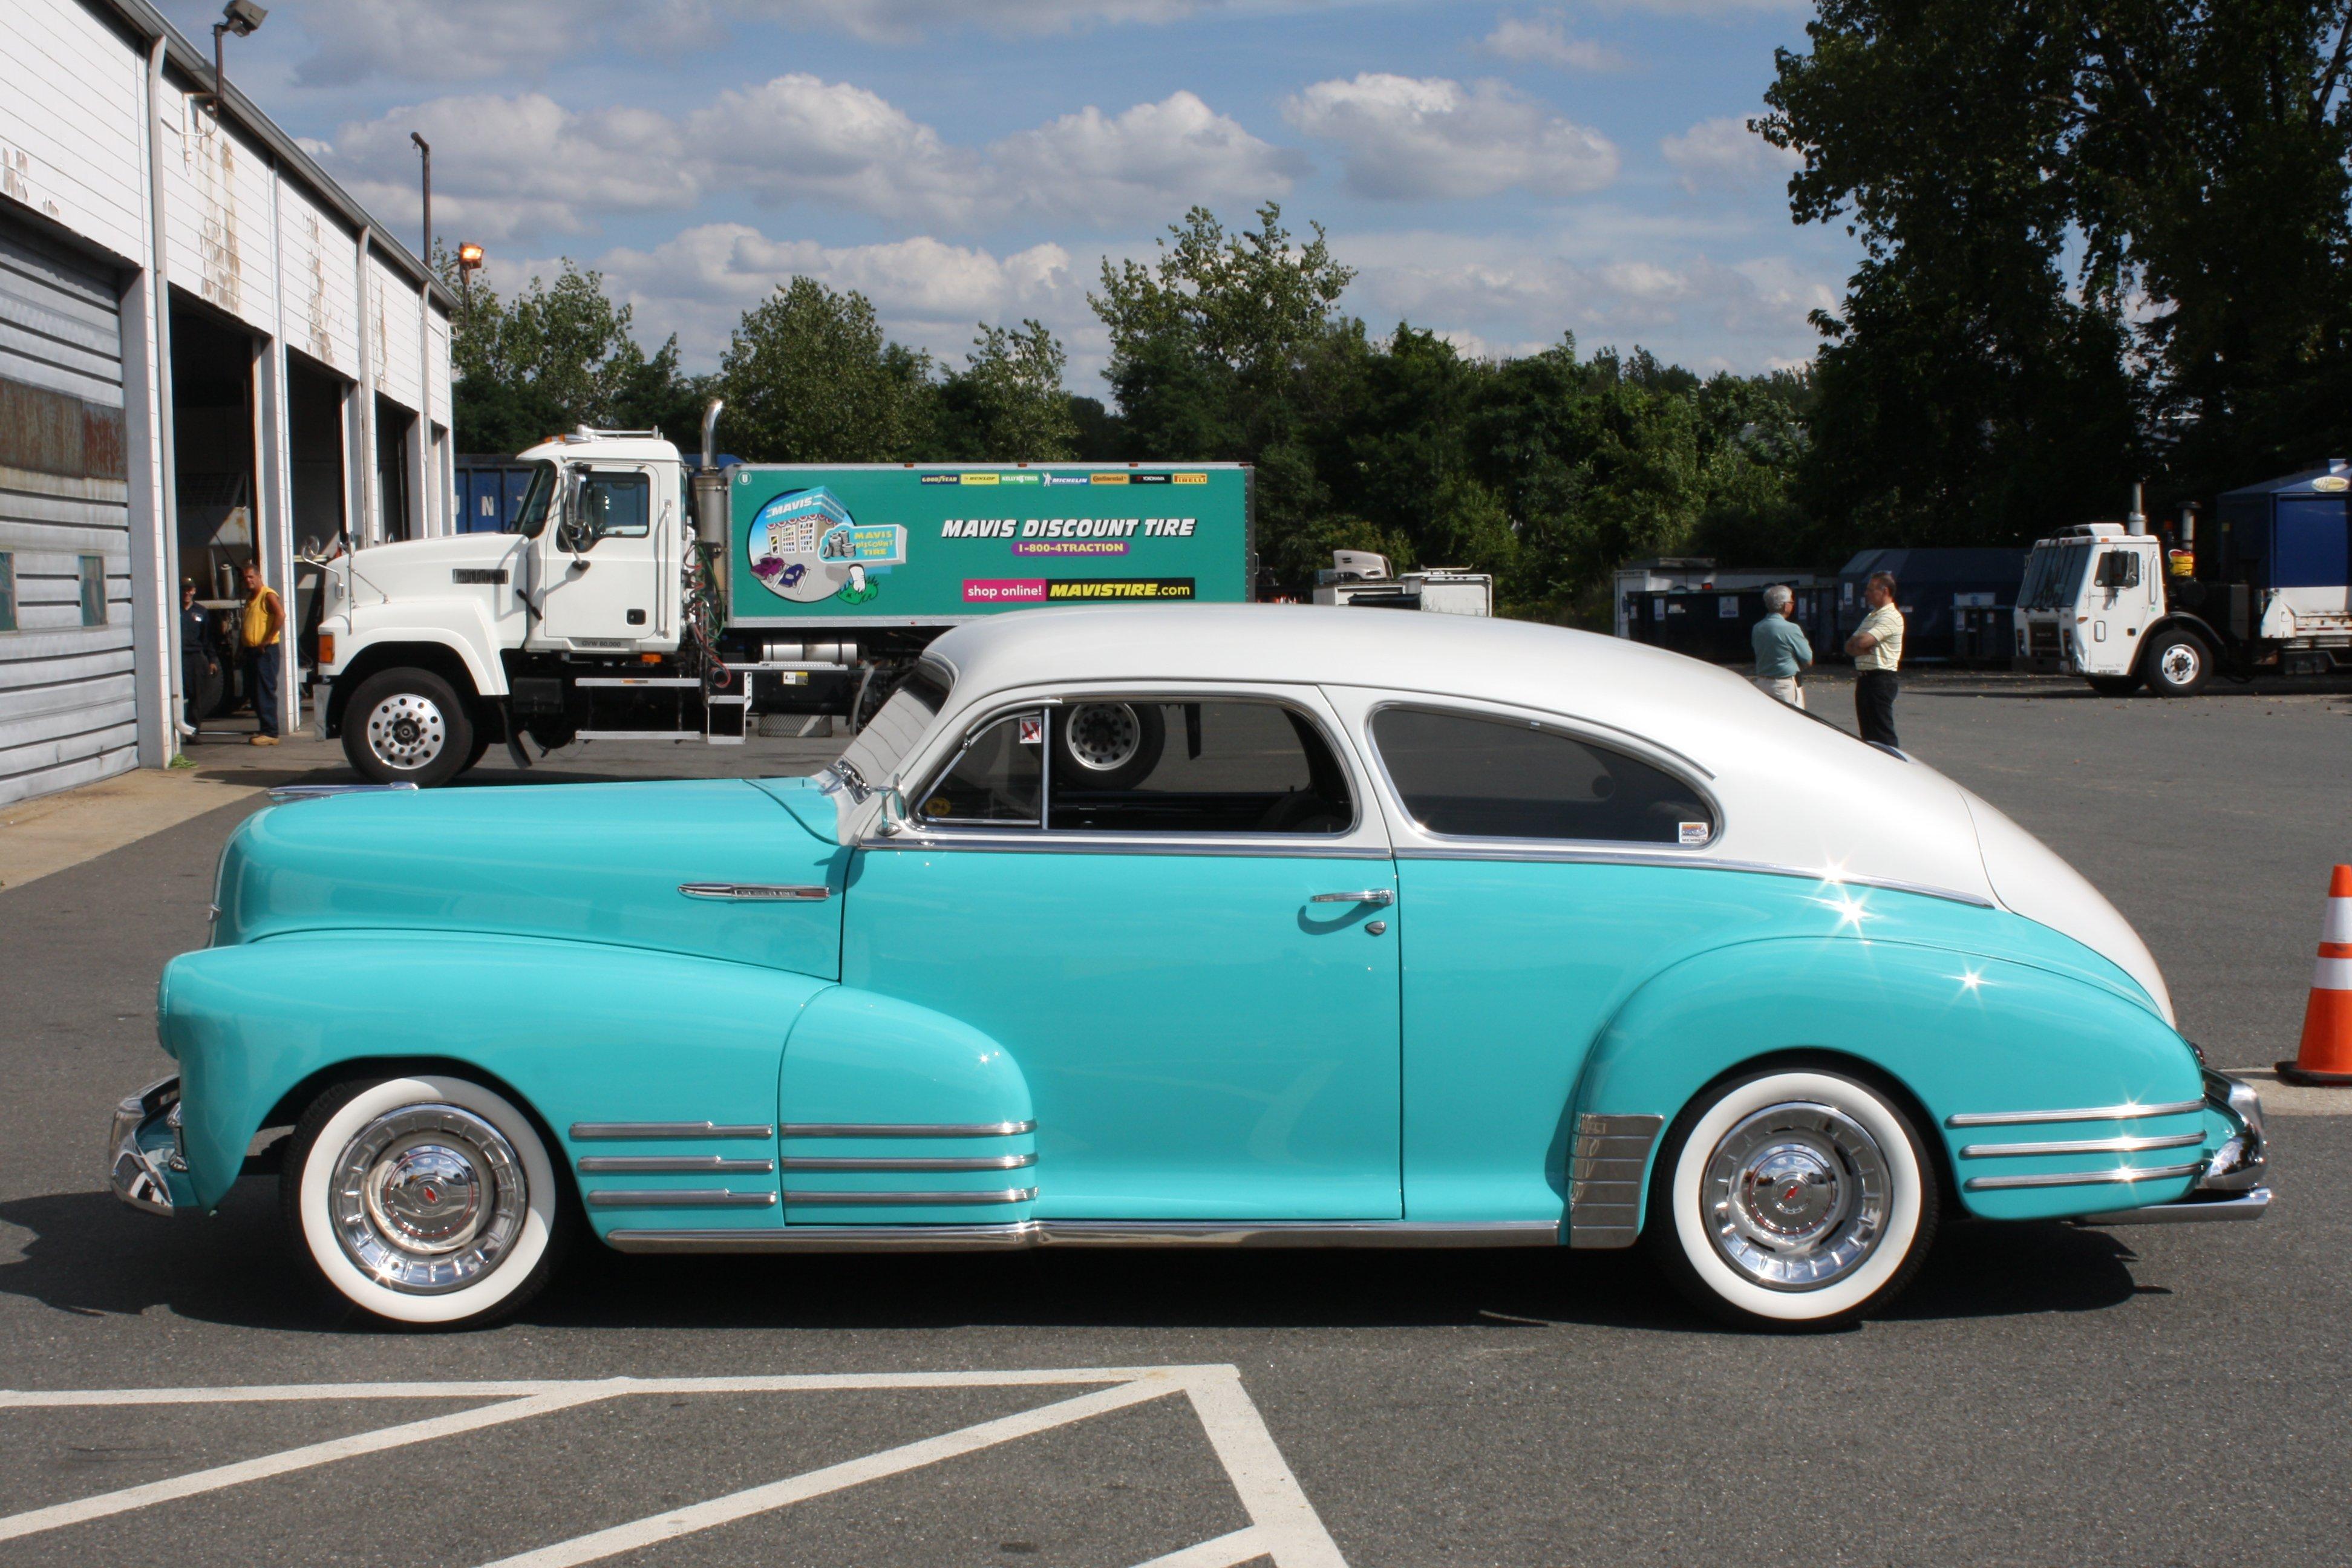 craigslist 1948 chevy fleetline autos post. Black Bedroom Furniture Sets. Home Design Ideas